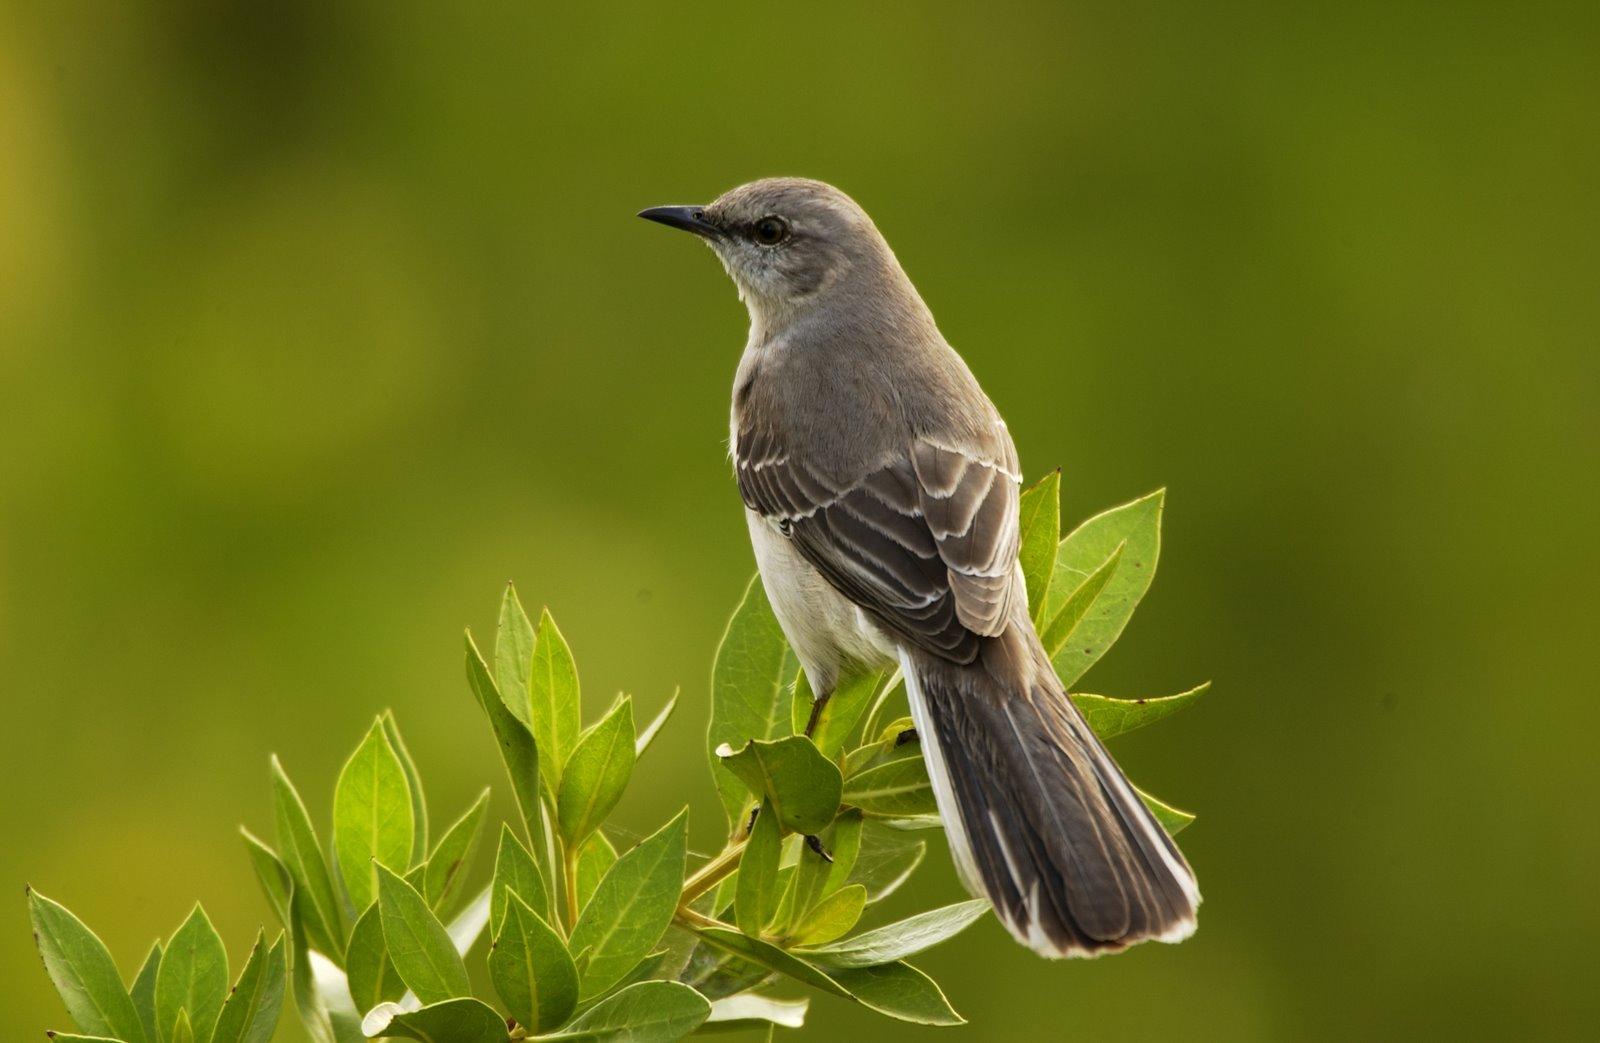 Dead mockingbird clipart